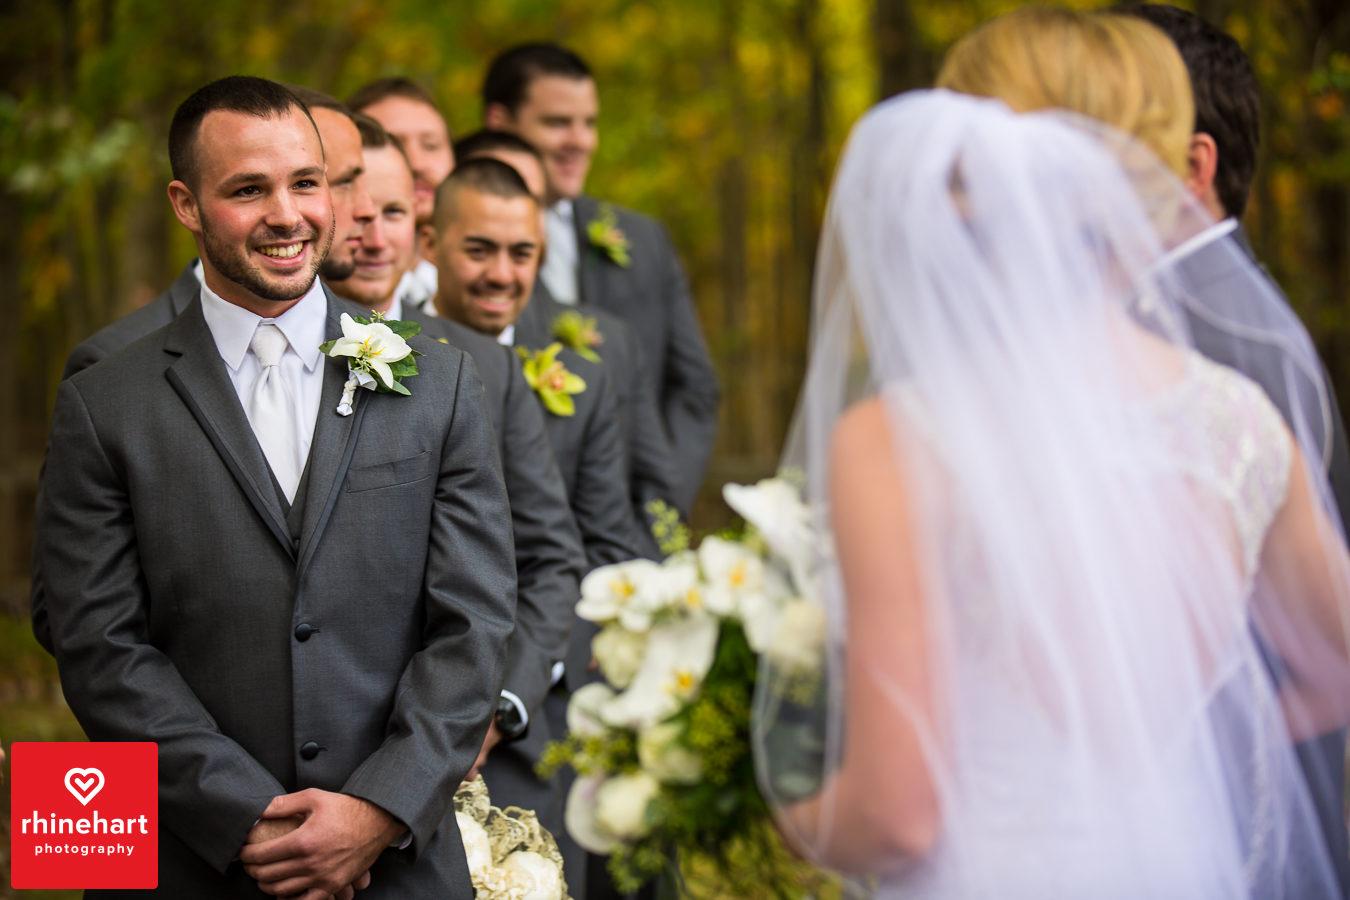 creative-unique-dc-area-wedding-photographers-10